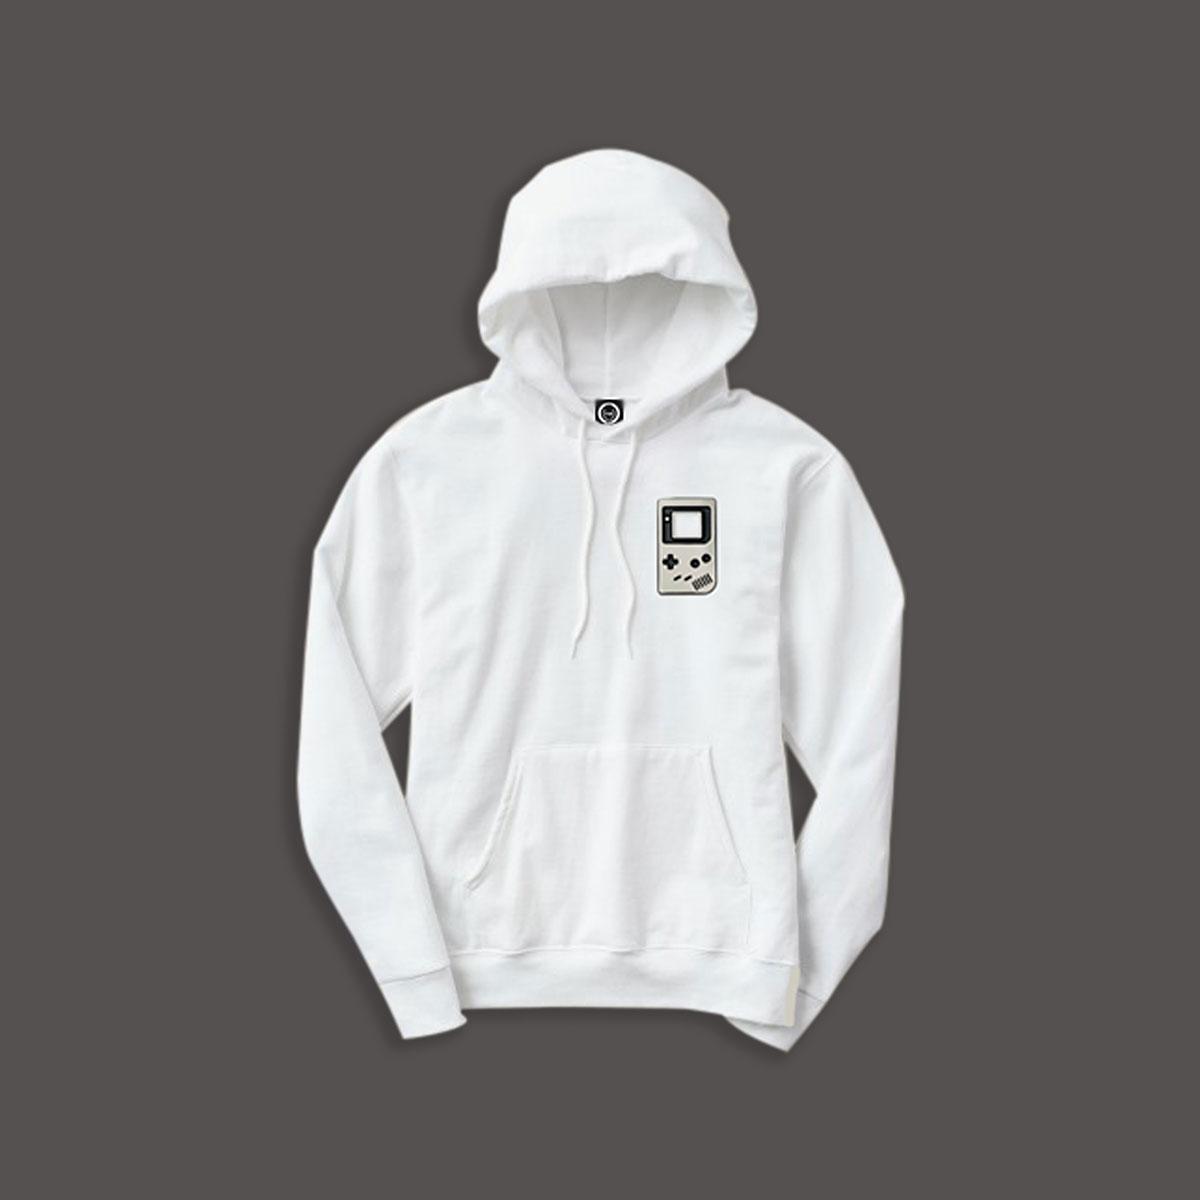 Gamer Pullover Hoodie - White